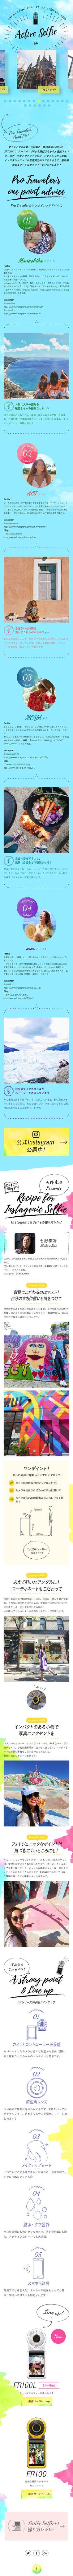 Active Selfie編|WEBデザイナーさん必見!スマホランディングページのデザイン参考に(アート・芸術系)